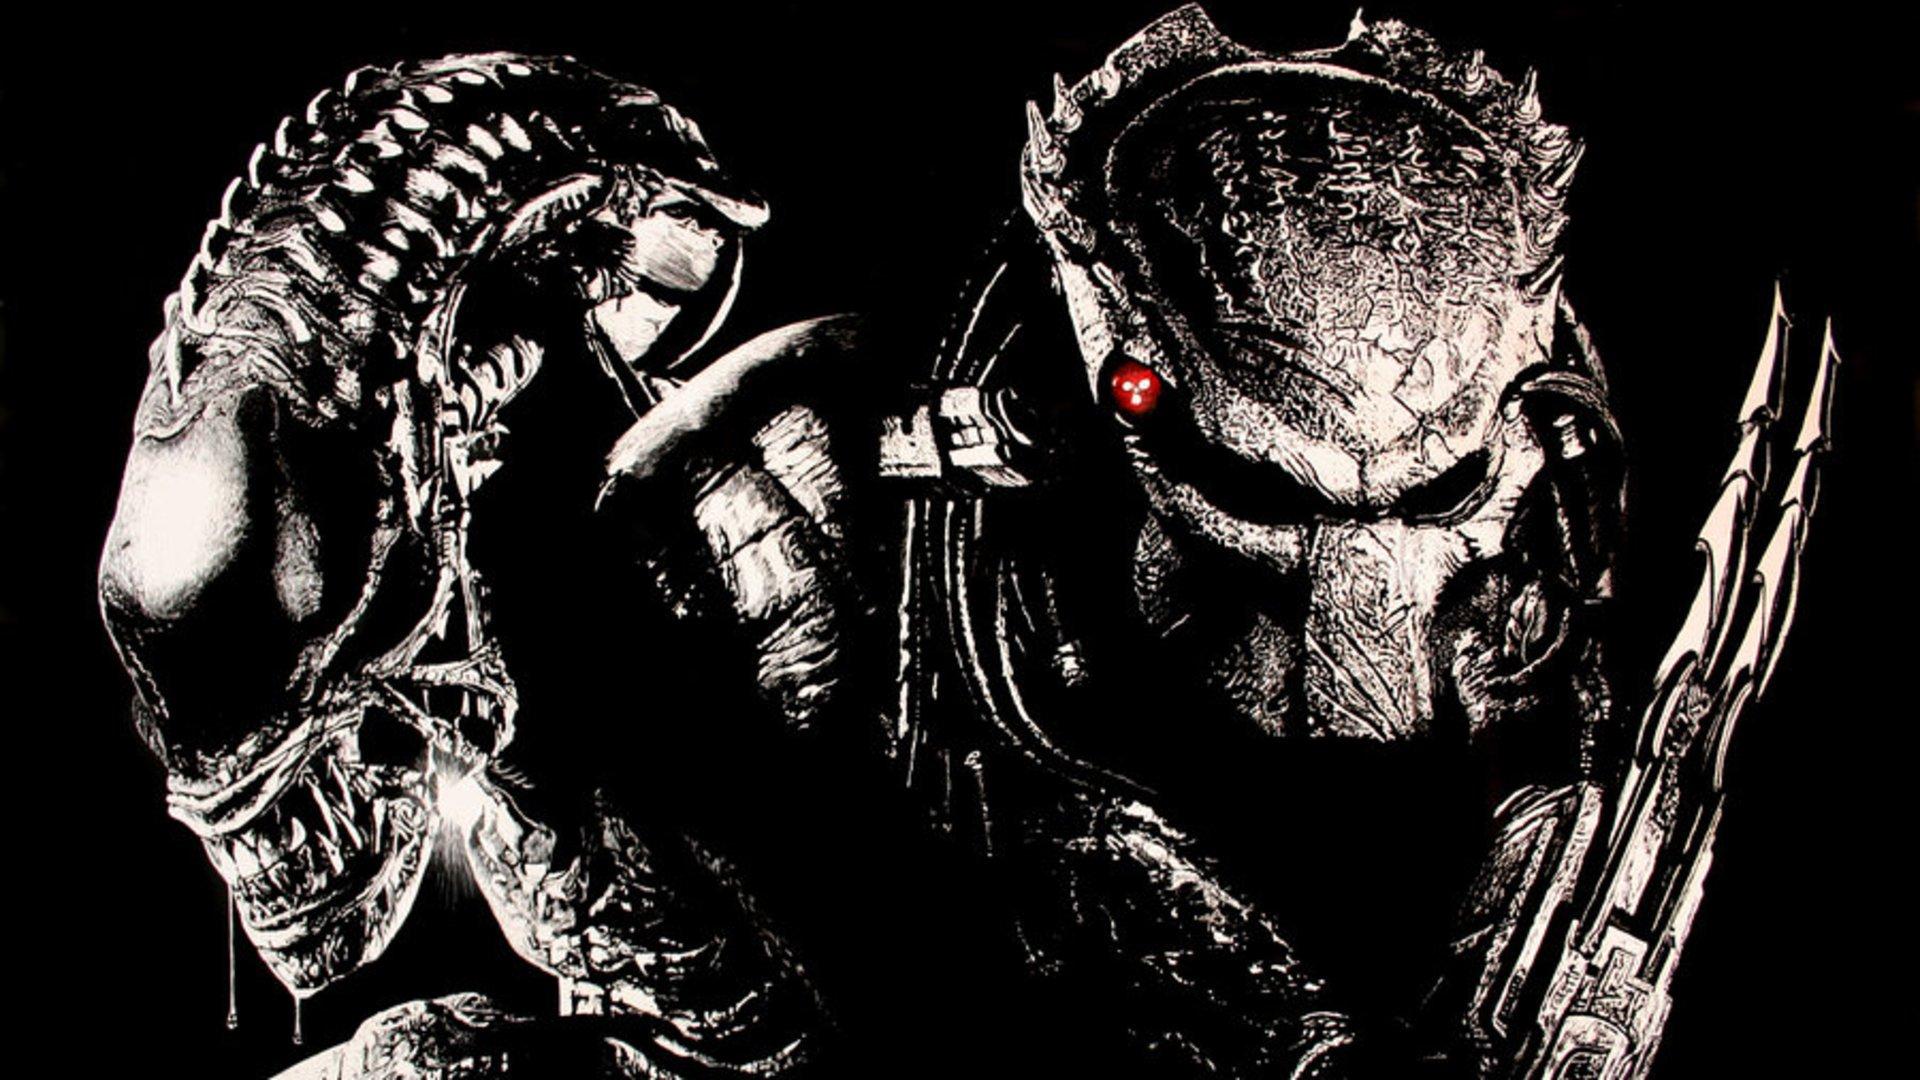 aliens vs. predator: requiem full hd wallpaper and background image